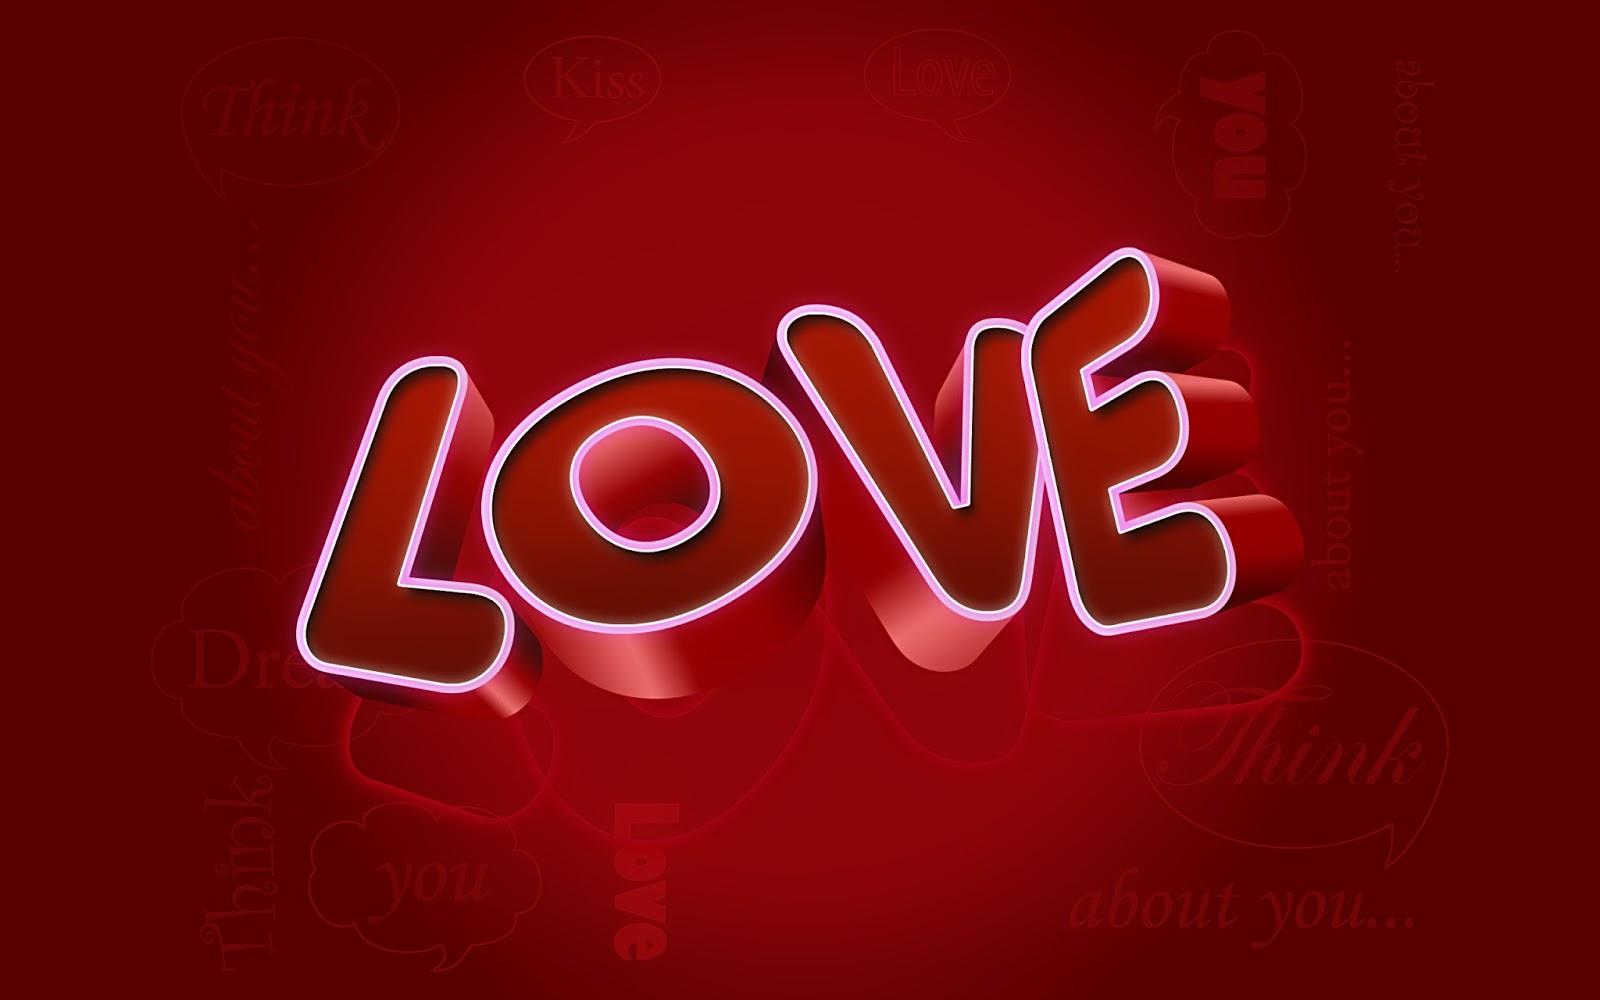 Love Words Wallpapers - Wallpapers